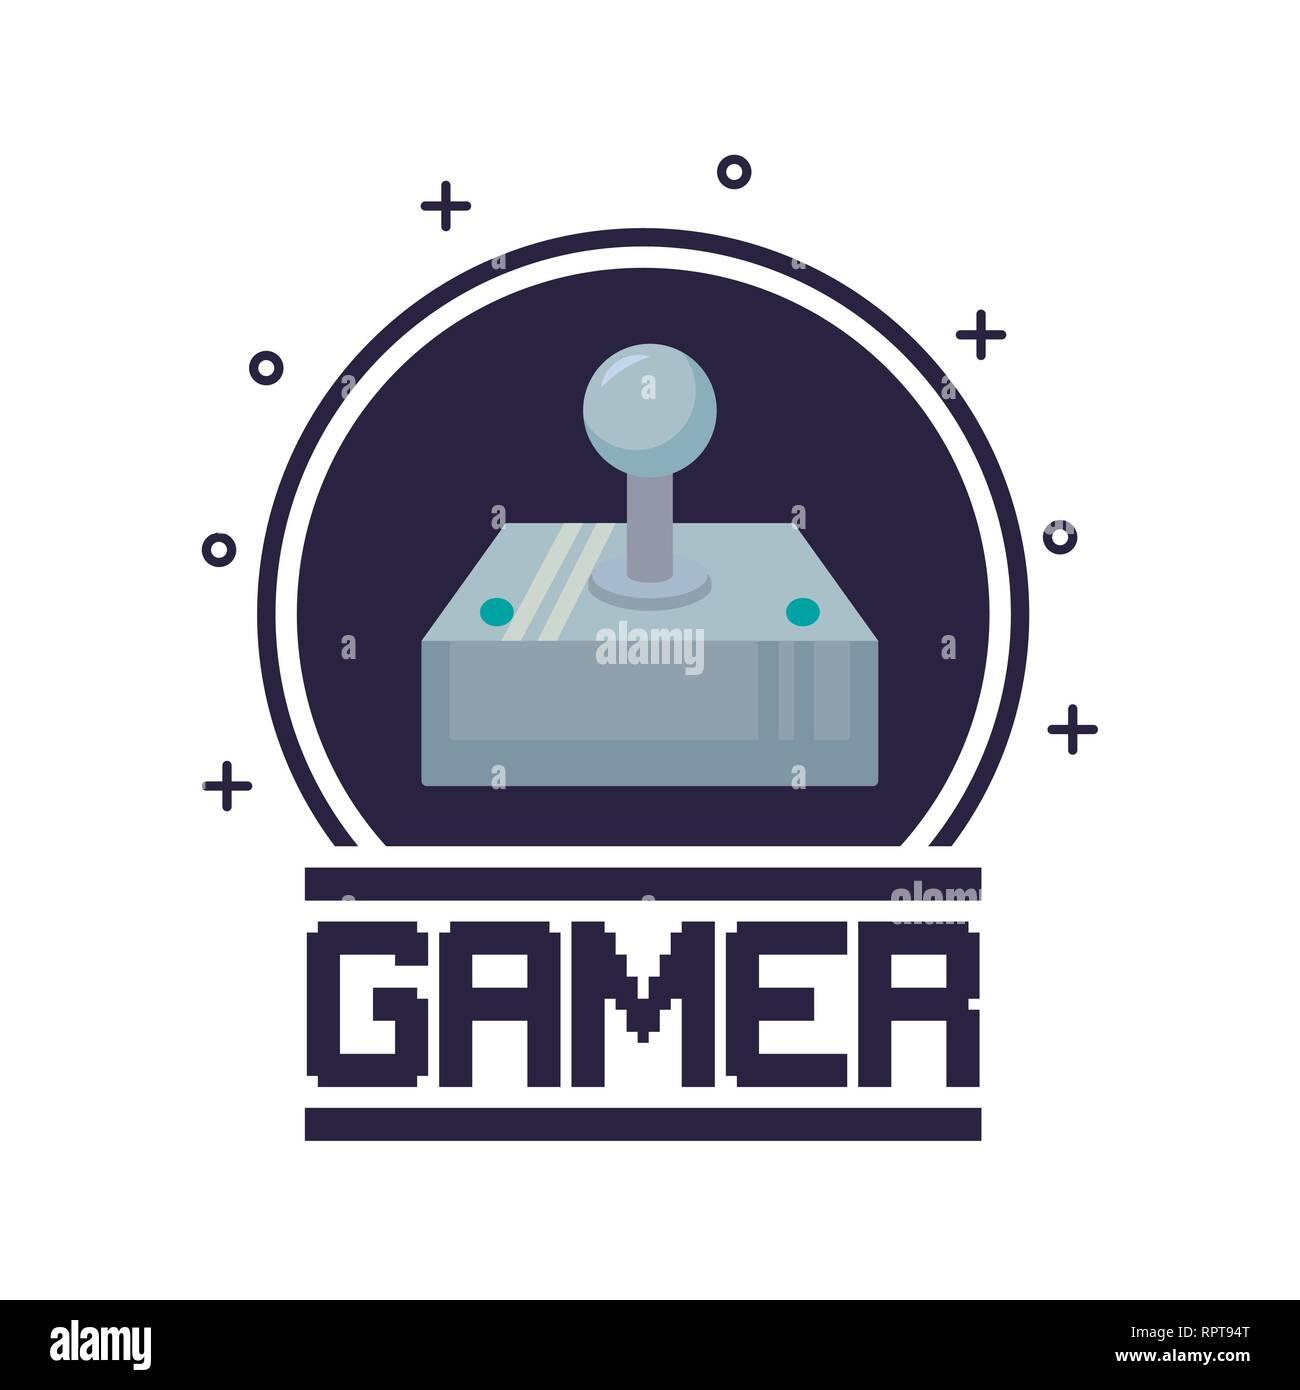 classic video game joystick vector illustration design - Stock Image